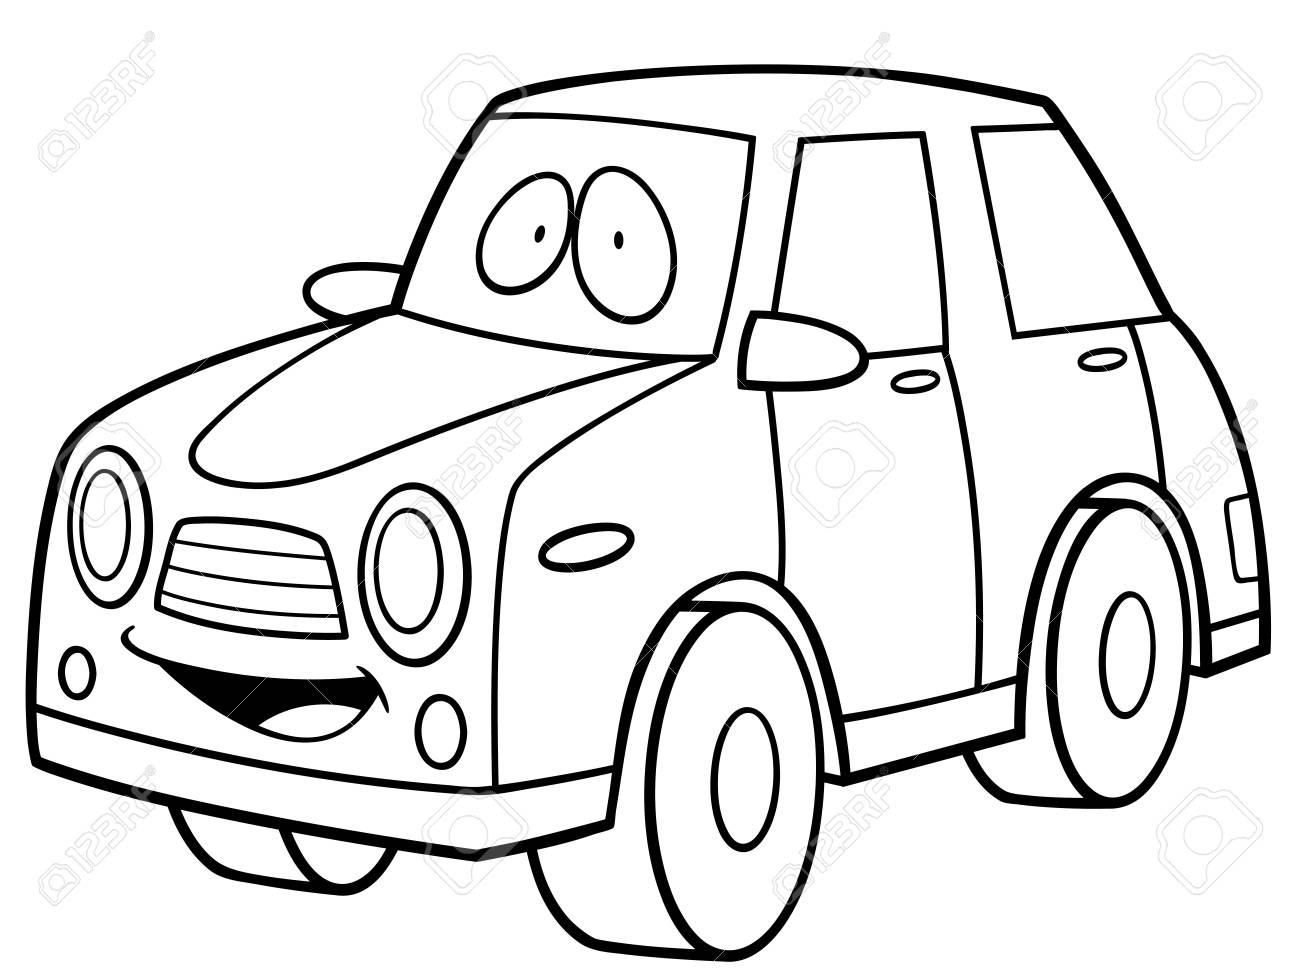 Ilustracion Vectorial De Dibujos Animados De Coches Libro Para